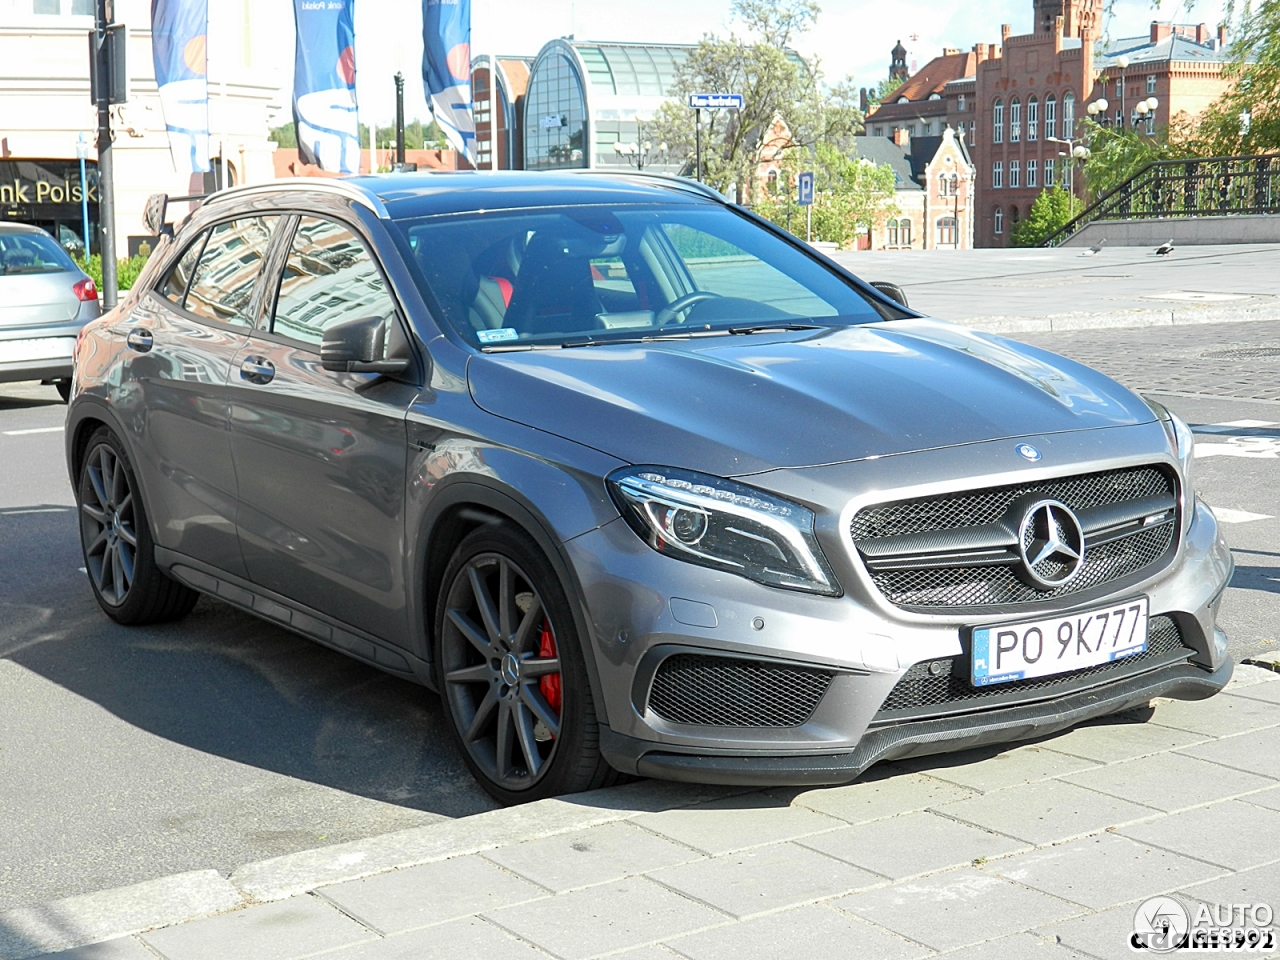 Mercedes benz gla 45 amg x156 1 junio 2017 autogespot for 2017 amg gla 45 mercedes benz